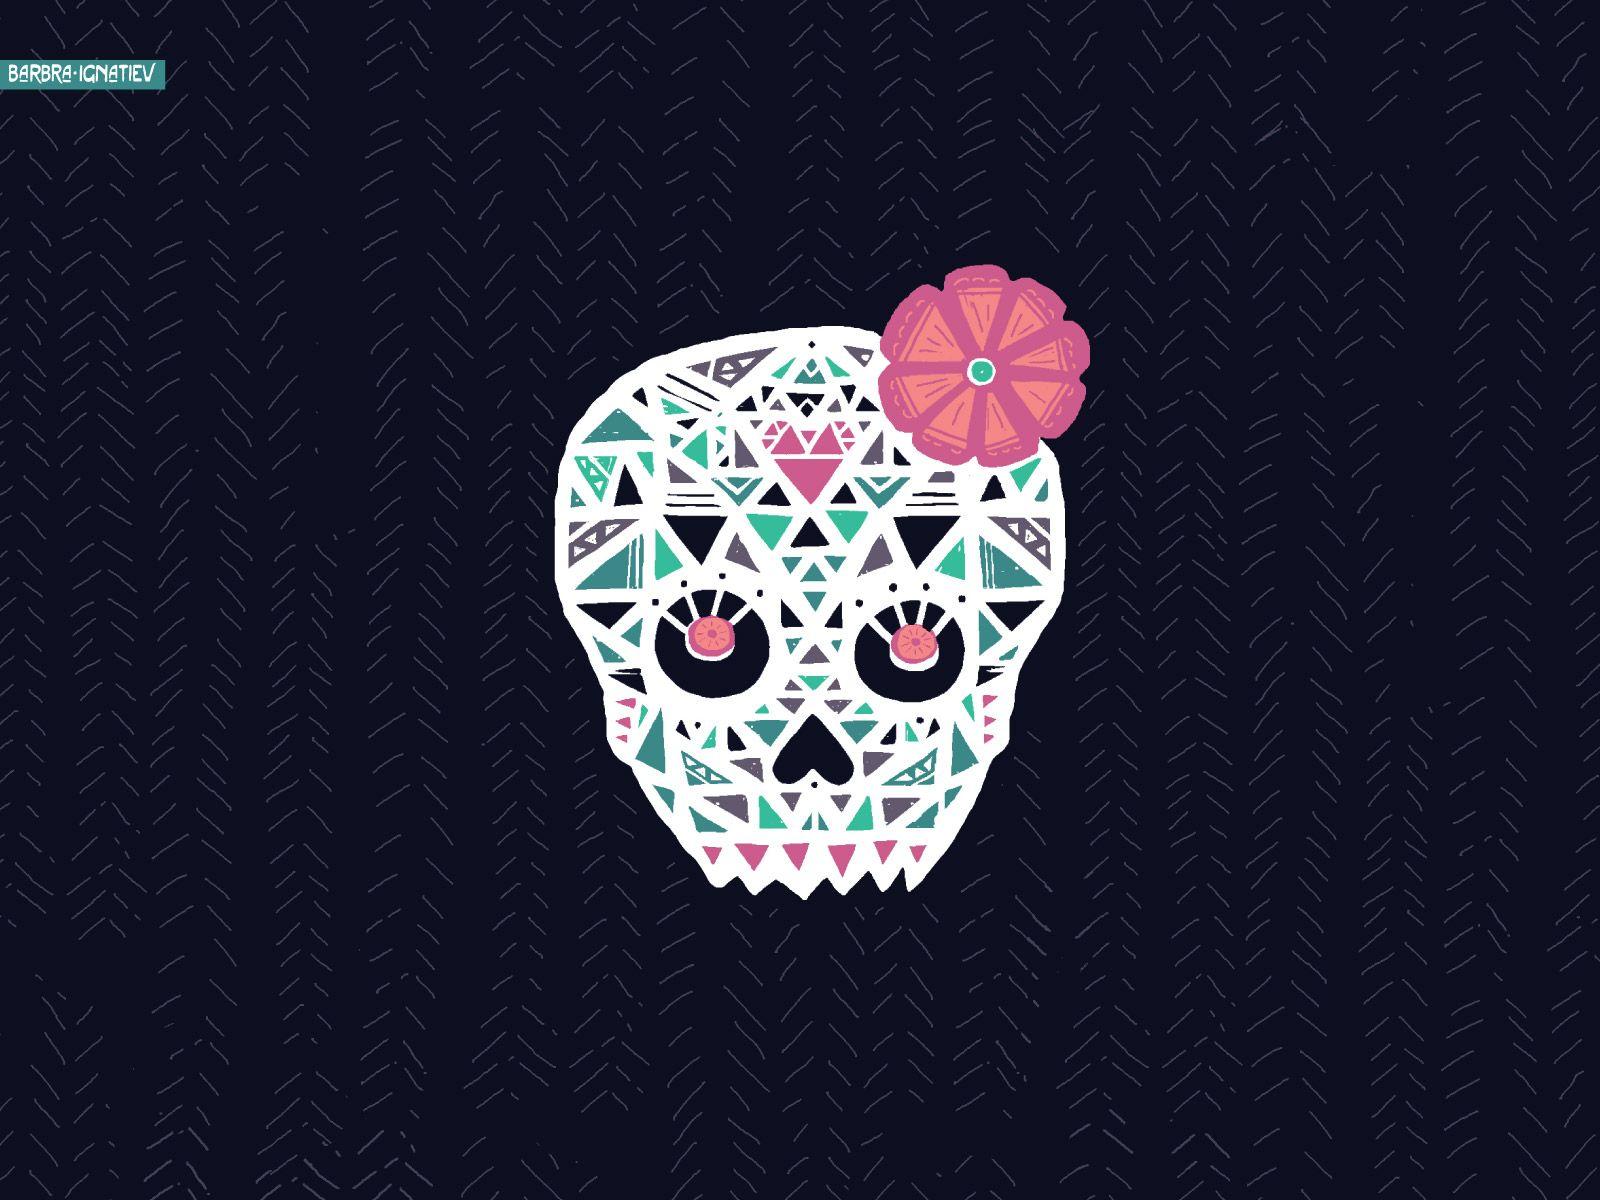 Pink sugar skull wallpaper mbulaho tumblr iphone wallpaper